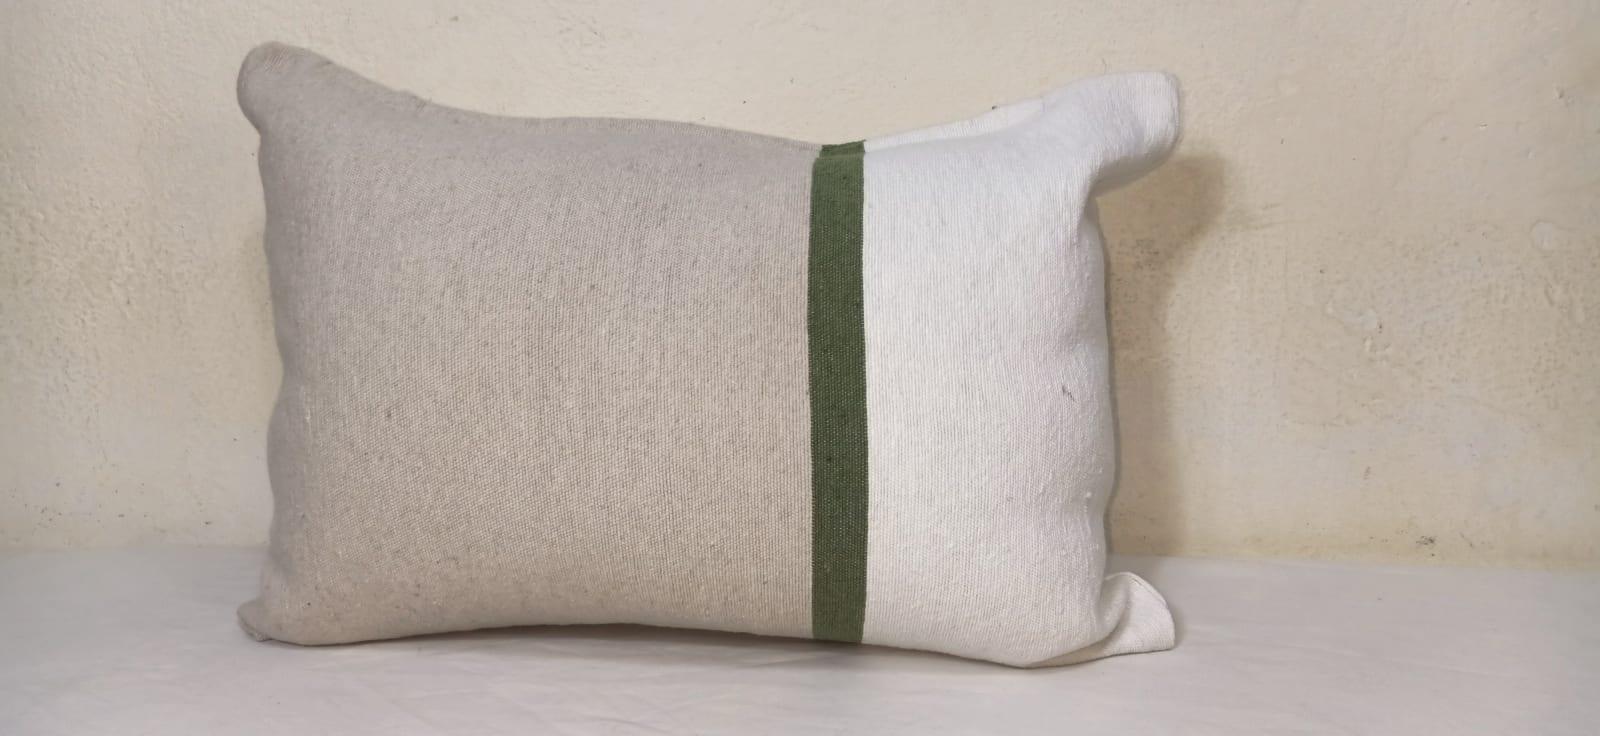 pillow  Green, Brown Morocco